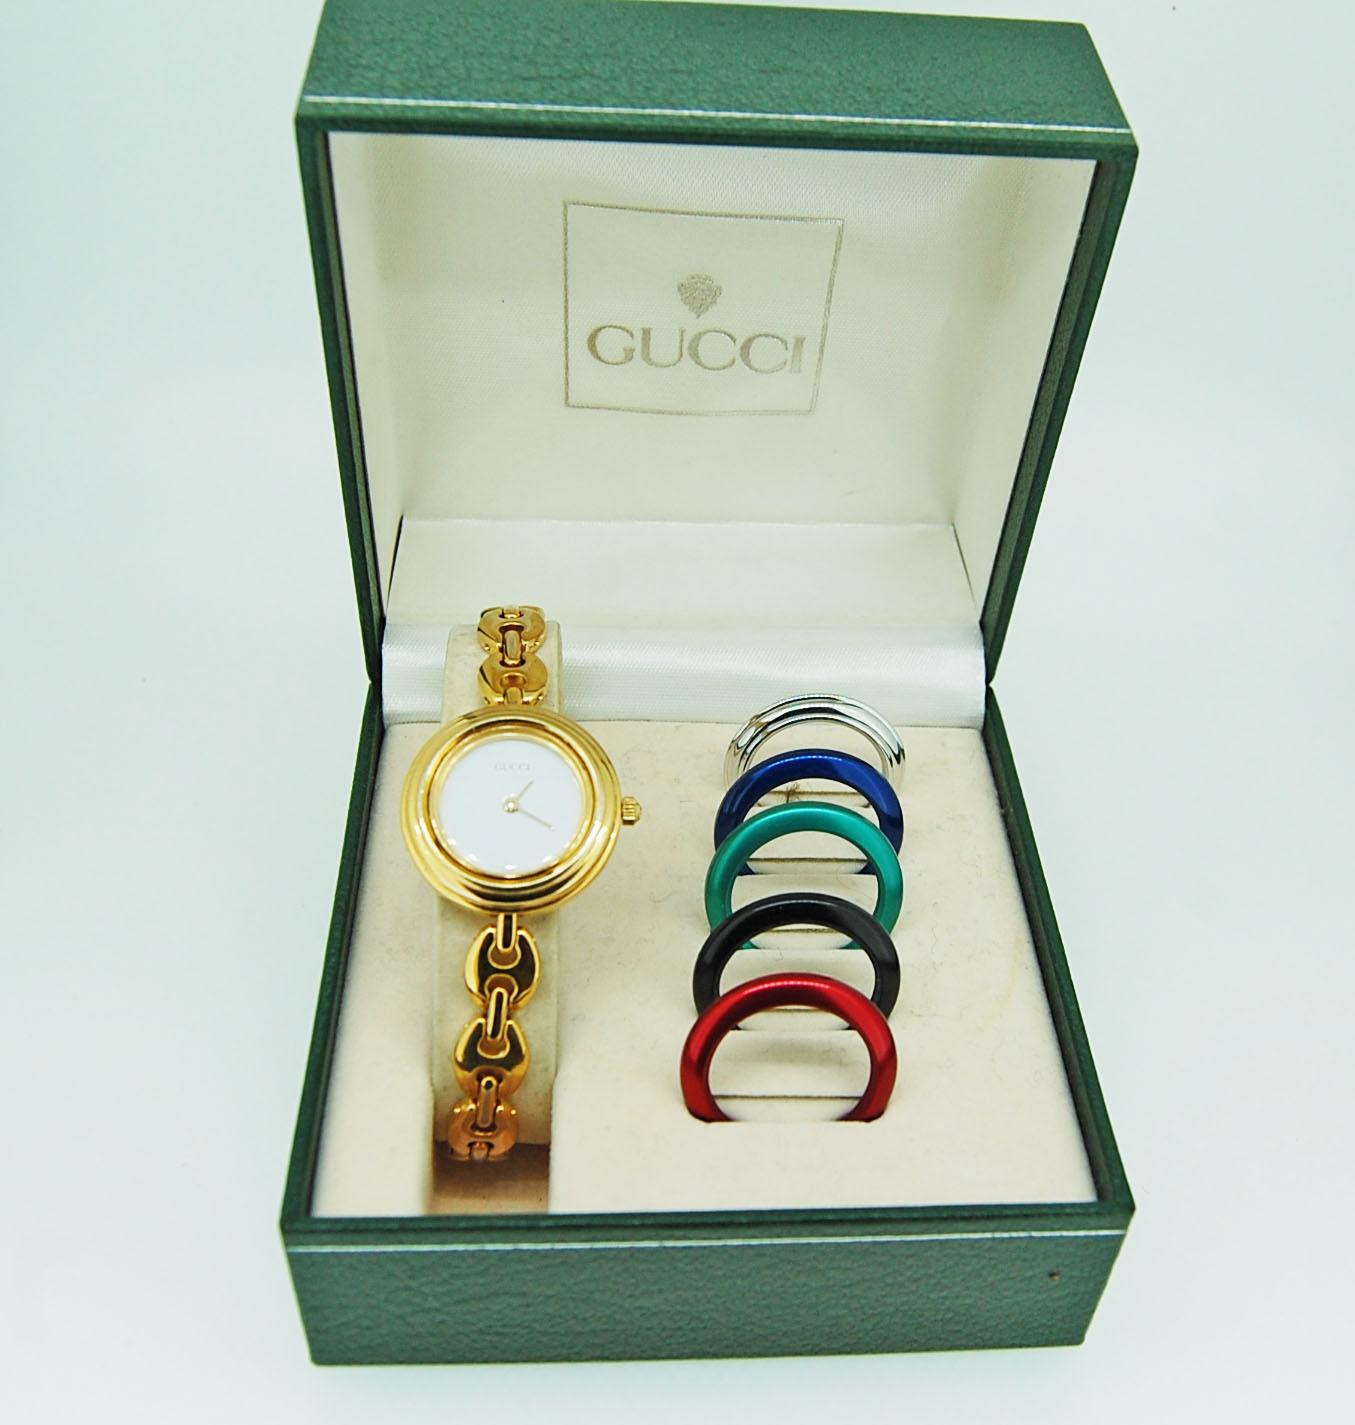 21949ba5241 Ladies Retro Gucci Bracelet Watch with 4-2 – Krafft Jewellers